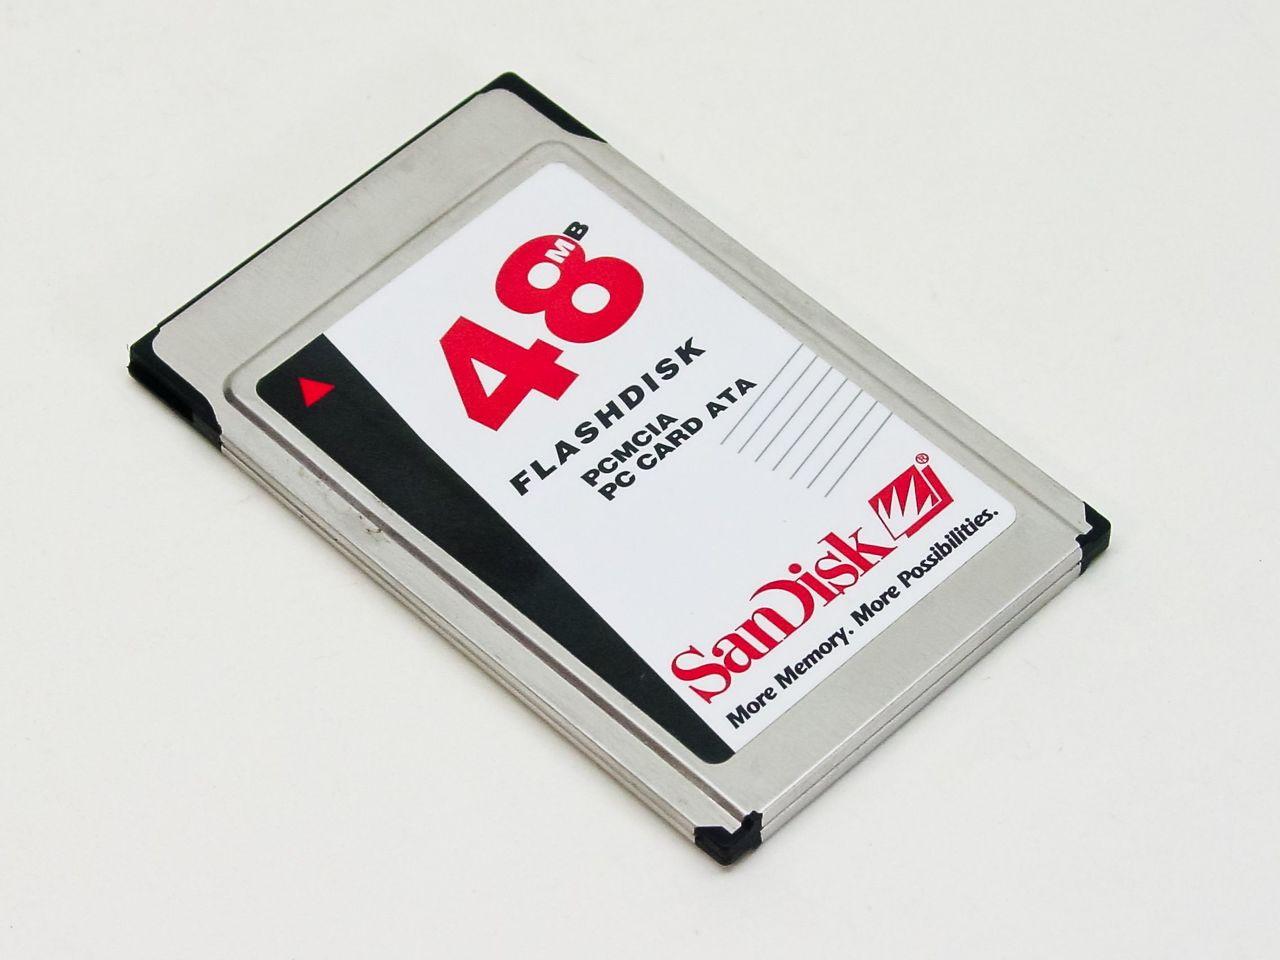 PC Card PCMCIA SANDISK 48MB Flashdisk Ata